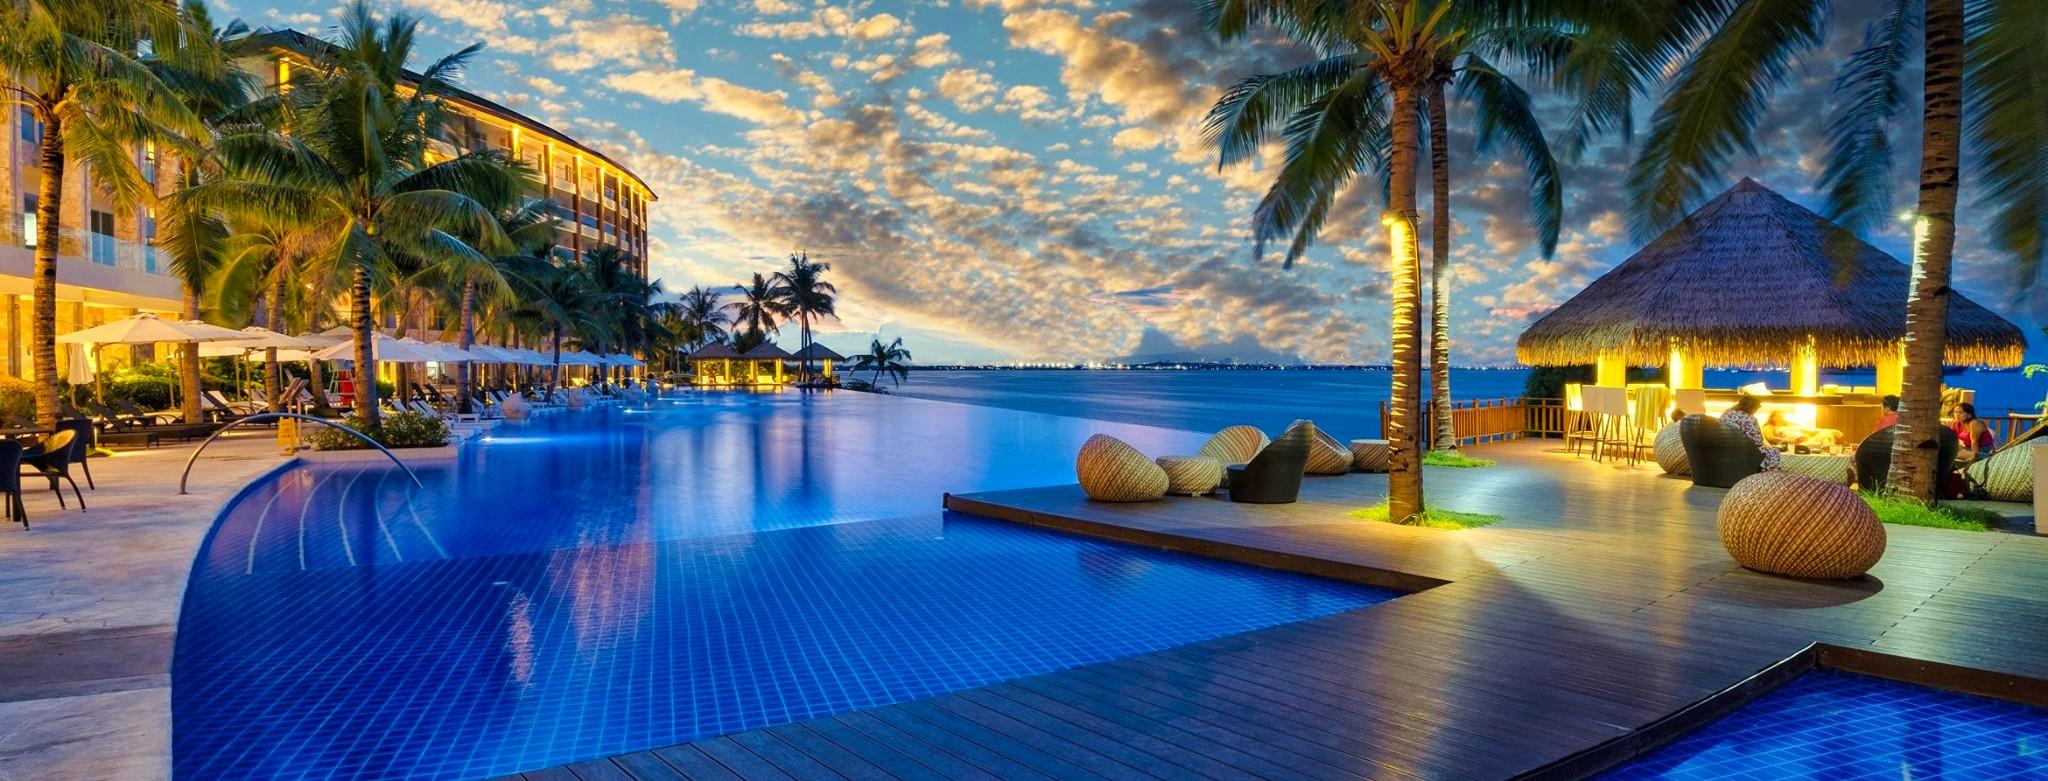 Pool View of Dusit Thani Resort Mactan